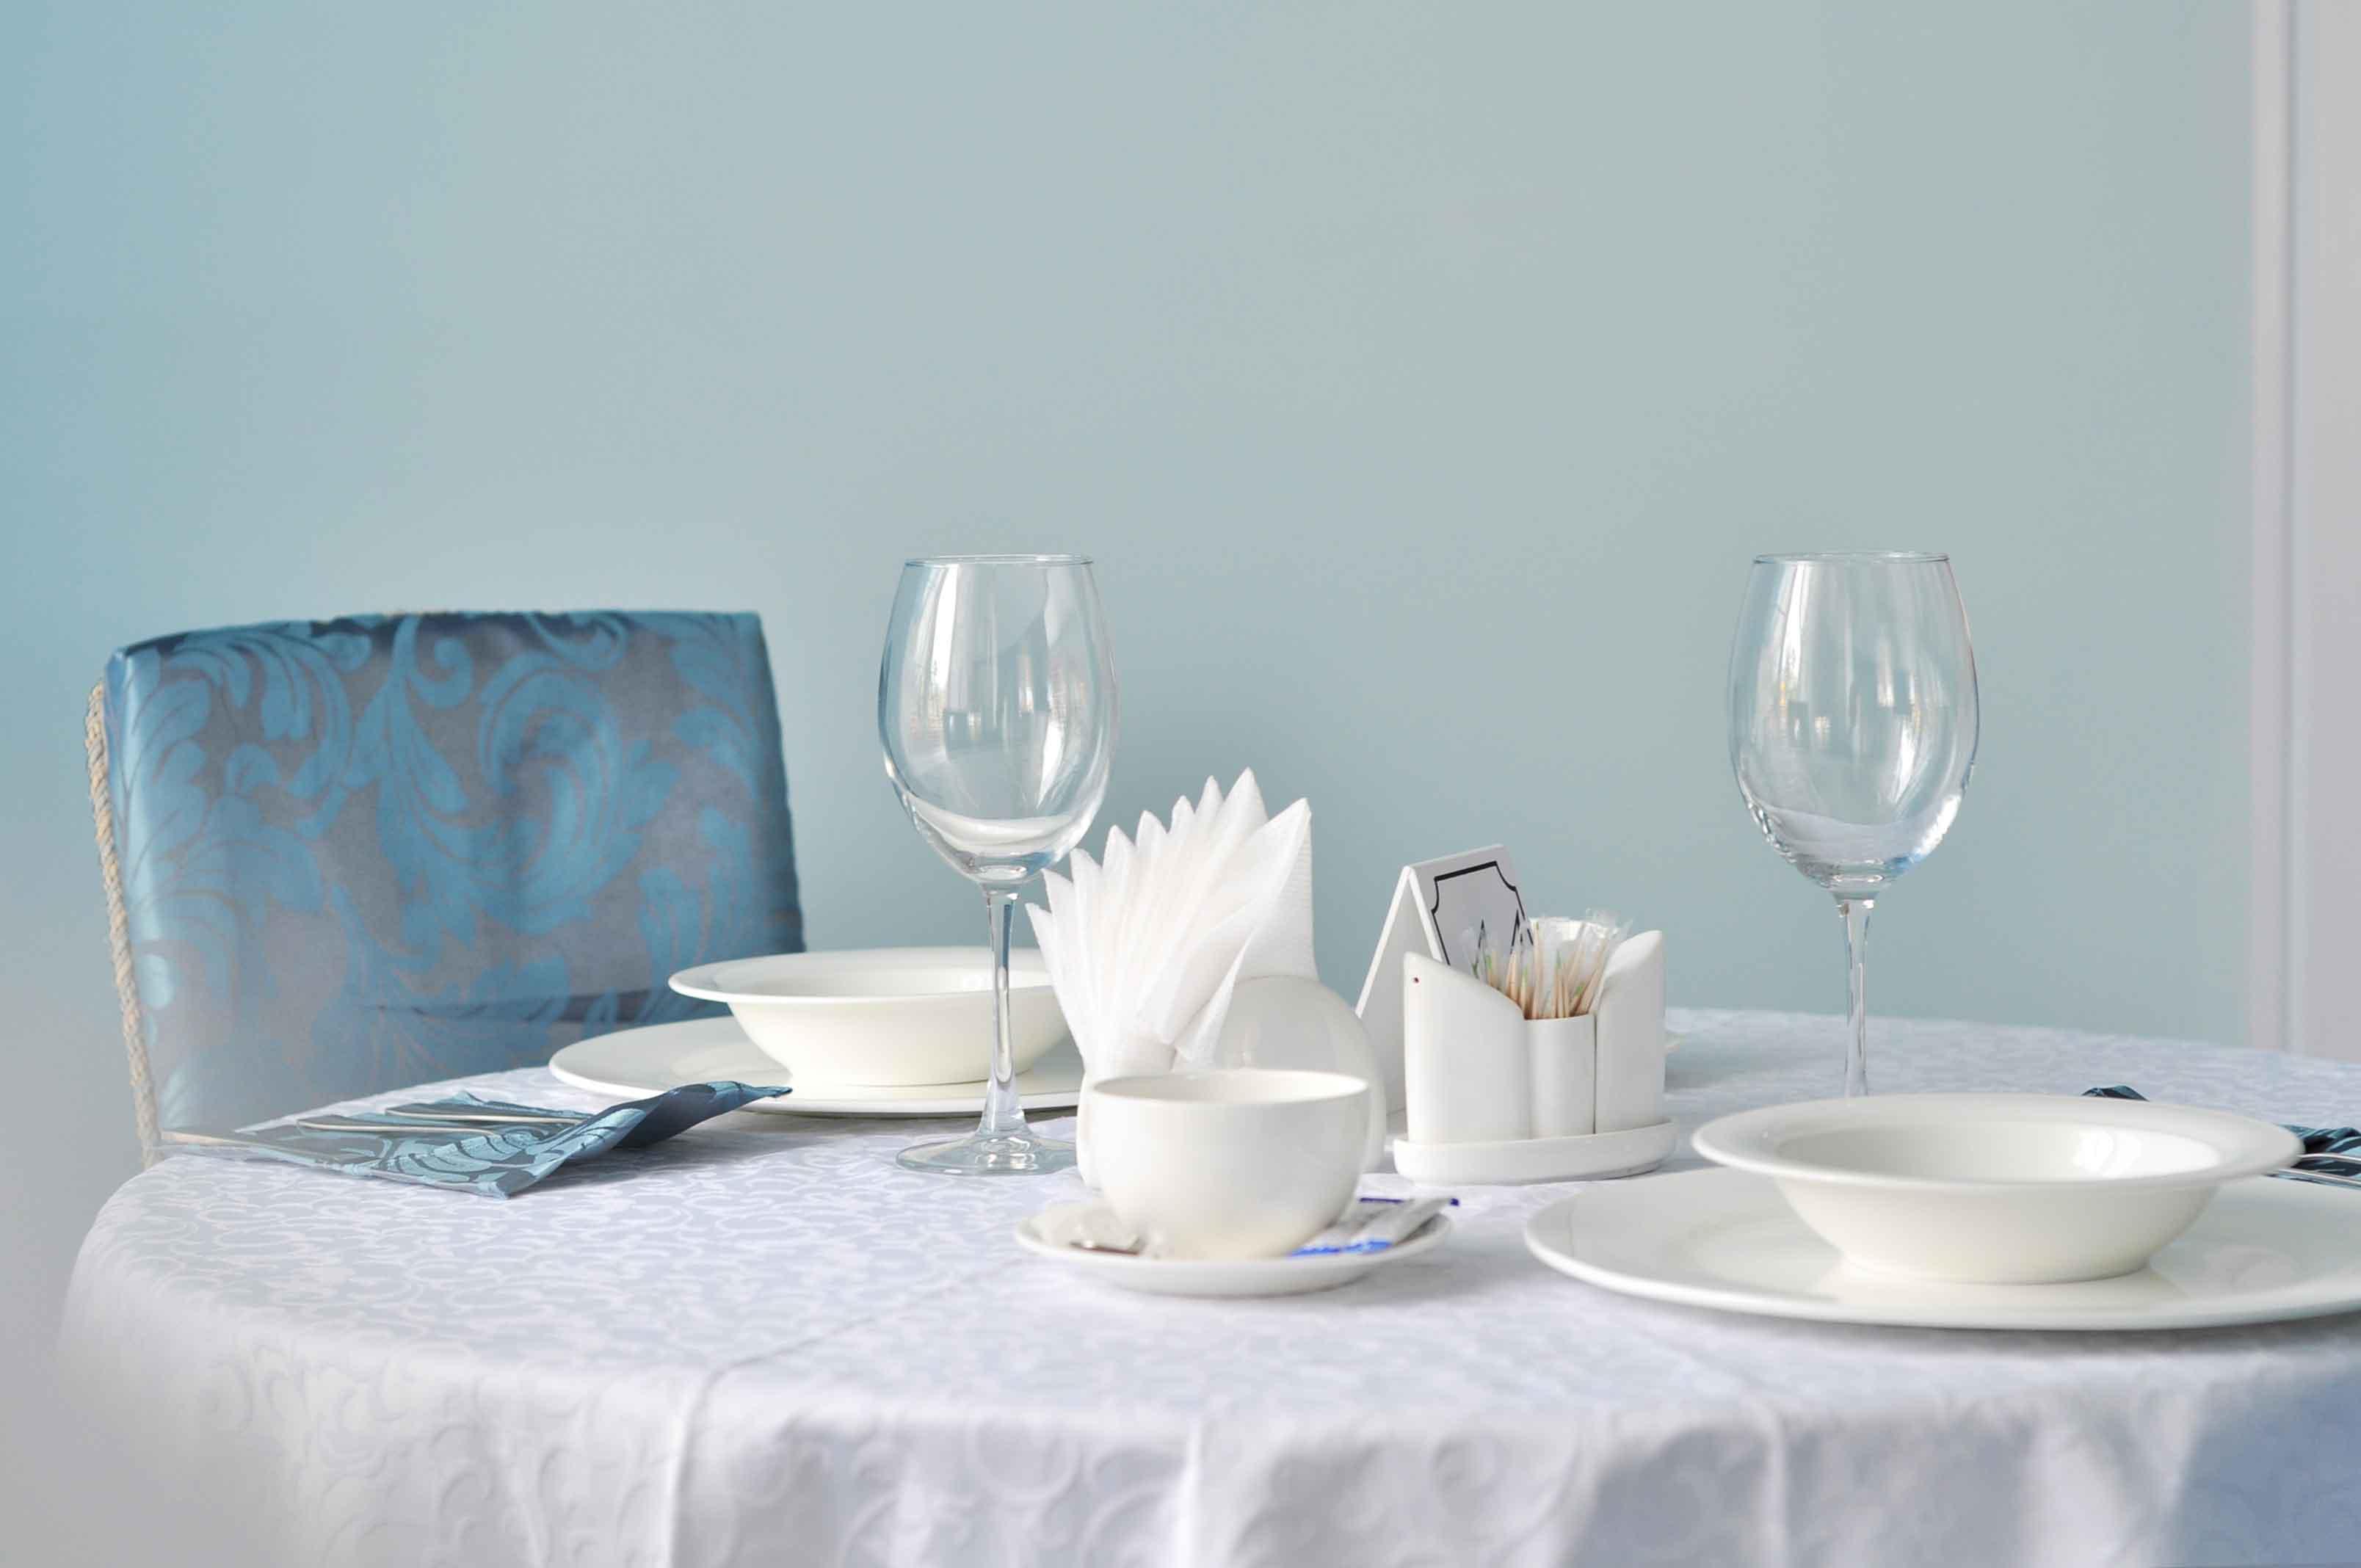 afina-hotel-restoran-berdjansk-2